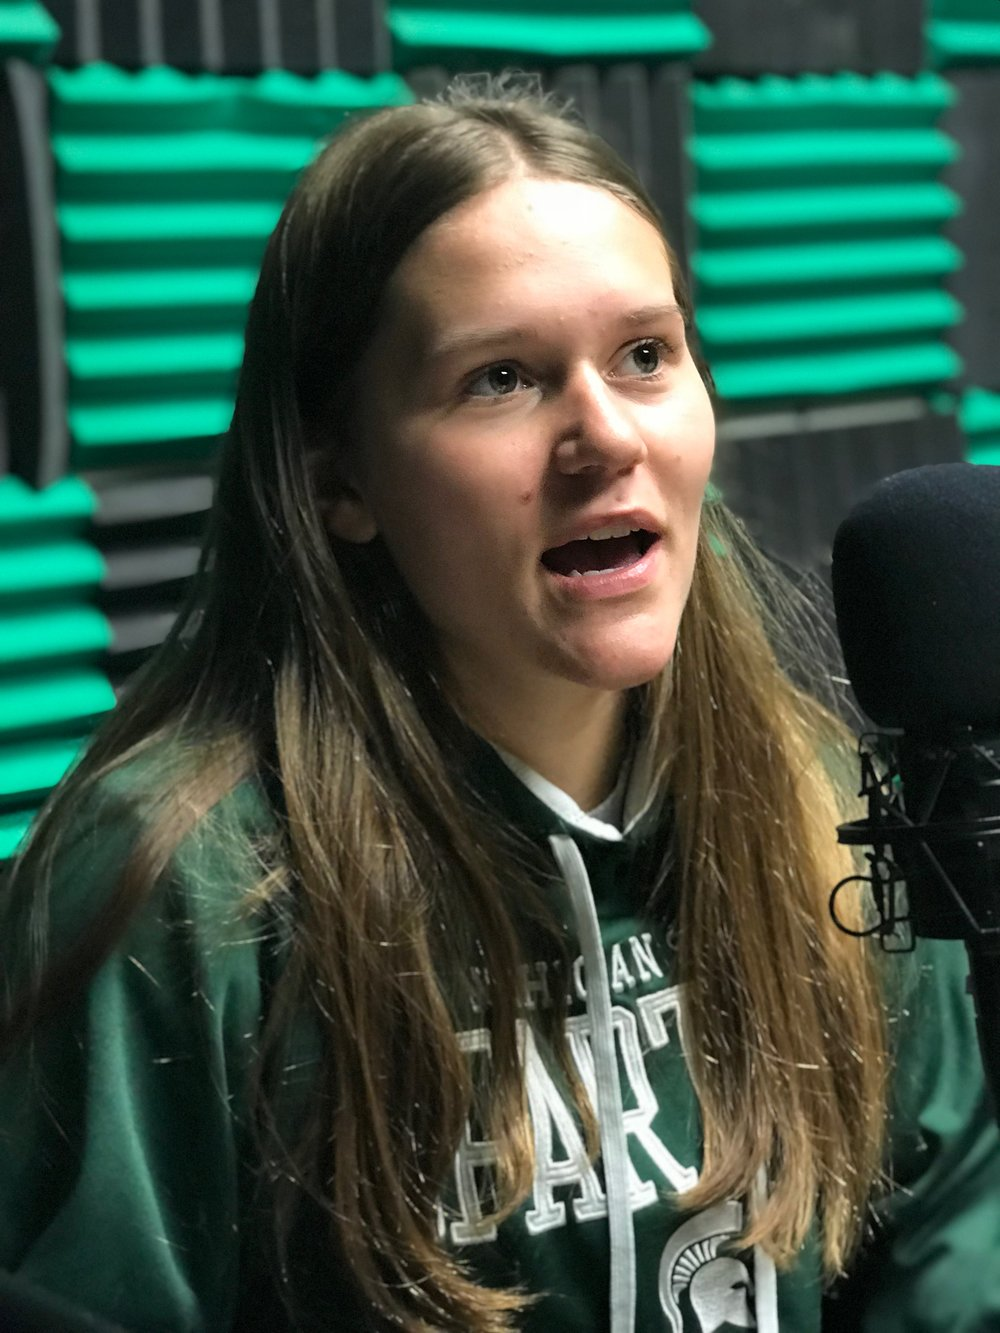 Nora Filbin (Age 14)